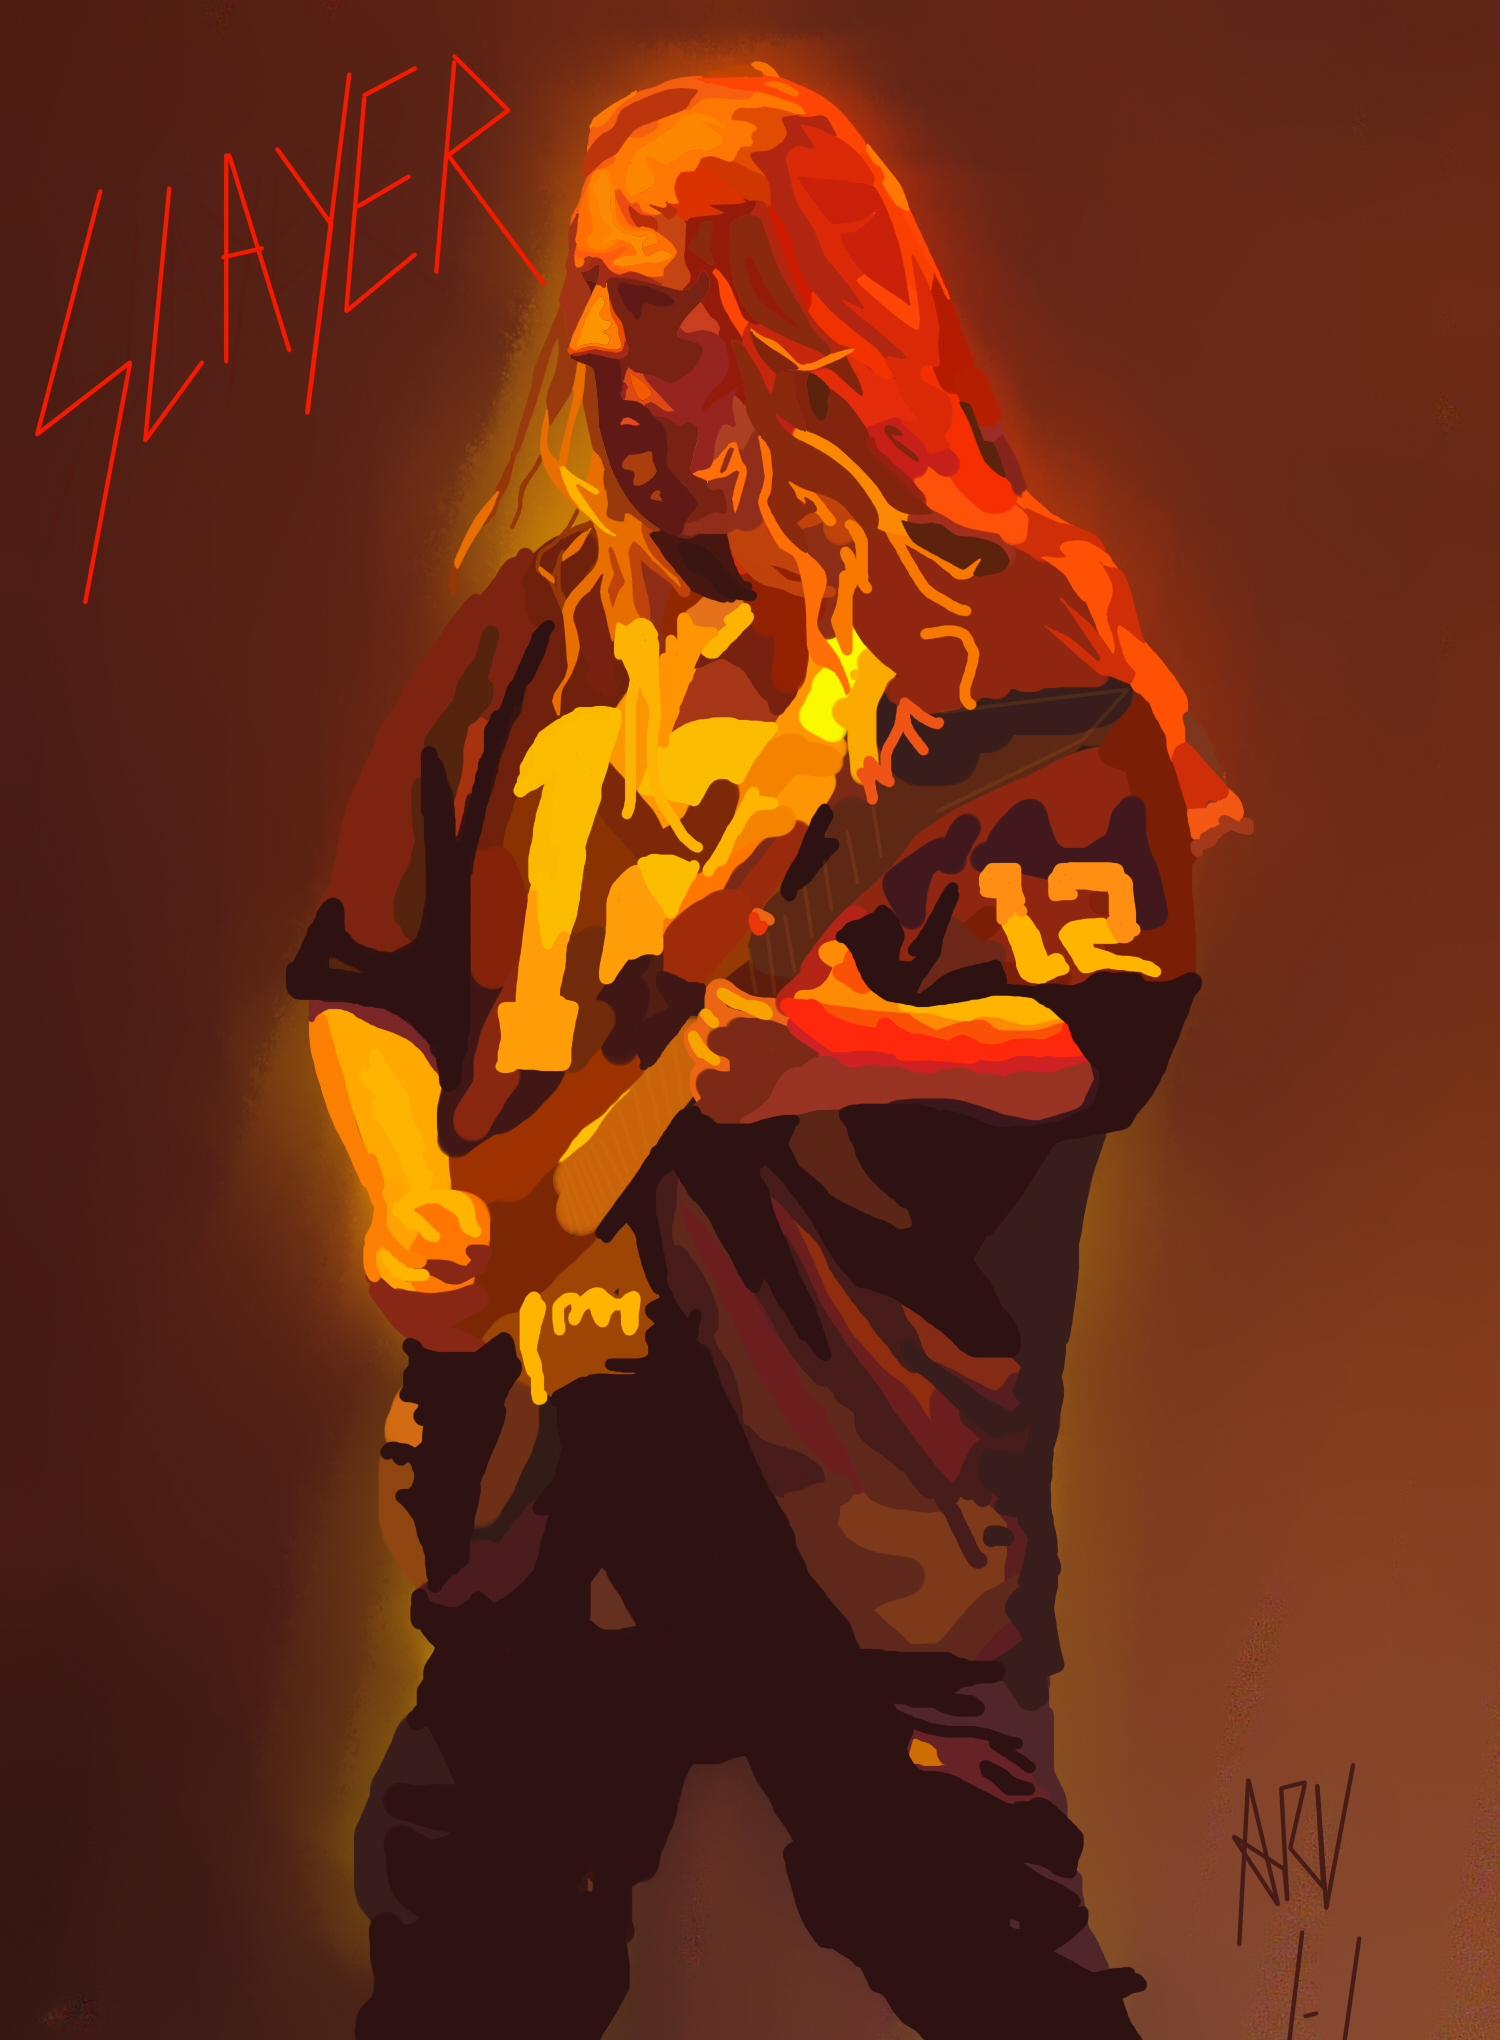 Jeff Hanneman R.I.P by ARandomUserl-l